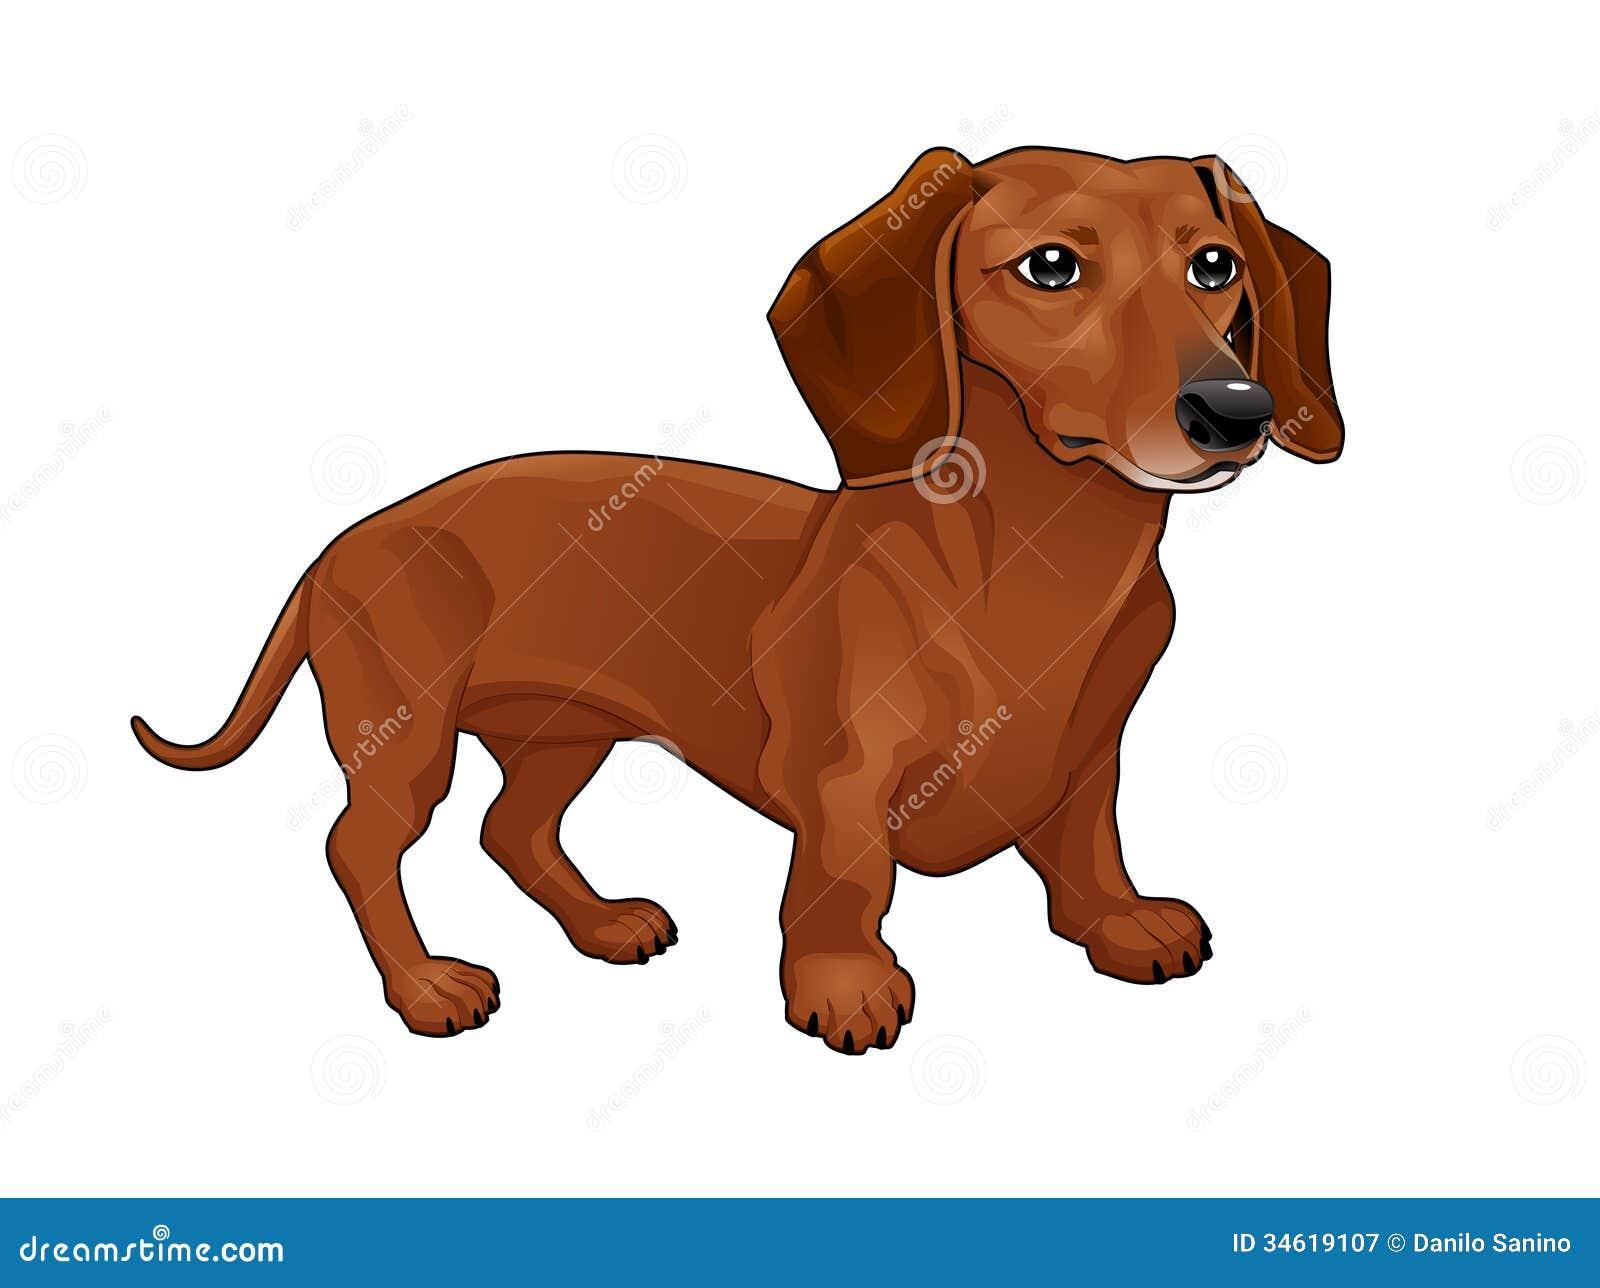 dachshund stock illustrations 4 695 dachshund stock illustrations rh dreamstime com Dachshund Christmas Clip Art Dachshund Images Free